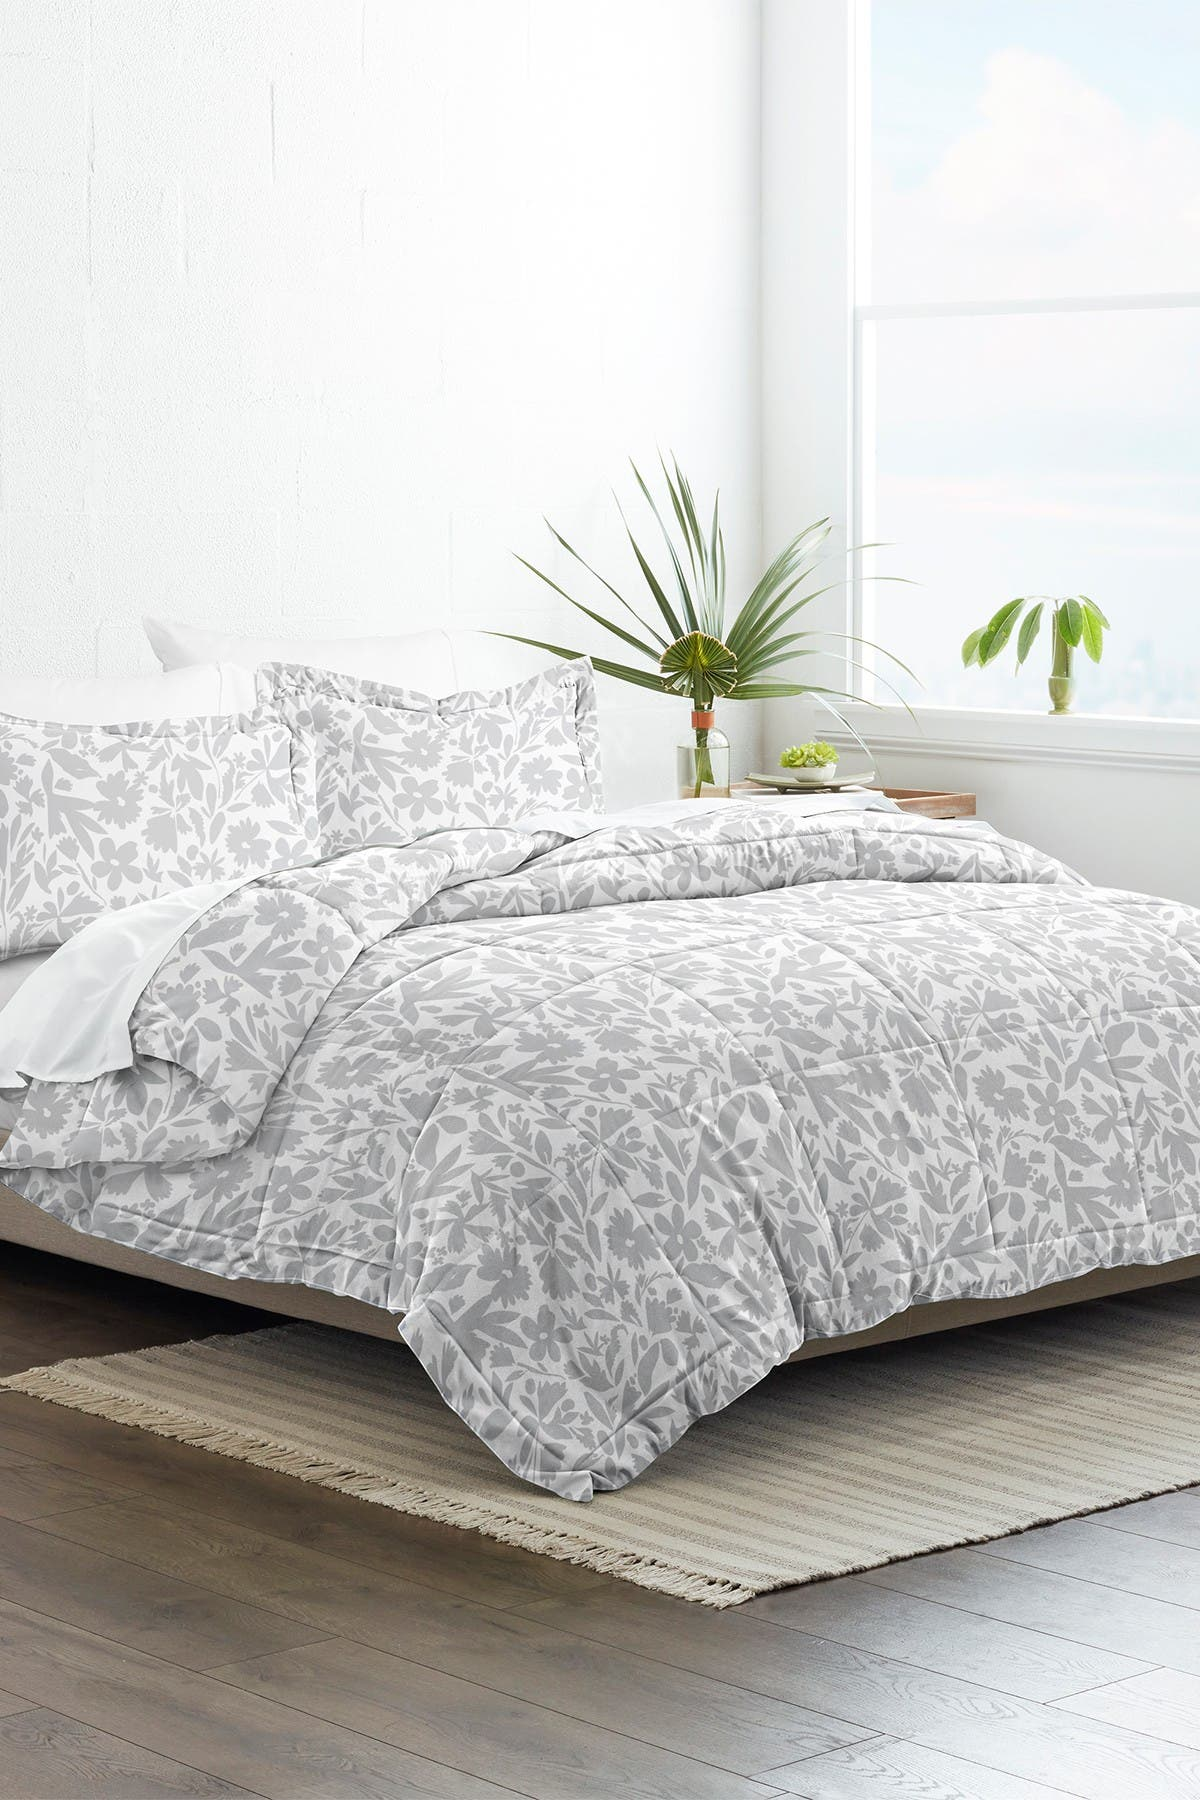 Ienjoy Home Home Collection Premium Down Alternative Abstract Garden Patterned Comforter Set Light Gray Full Queen Nordstrom Rack